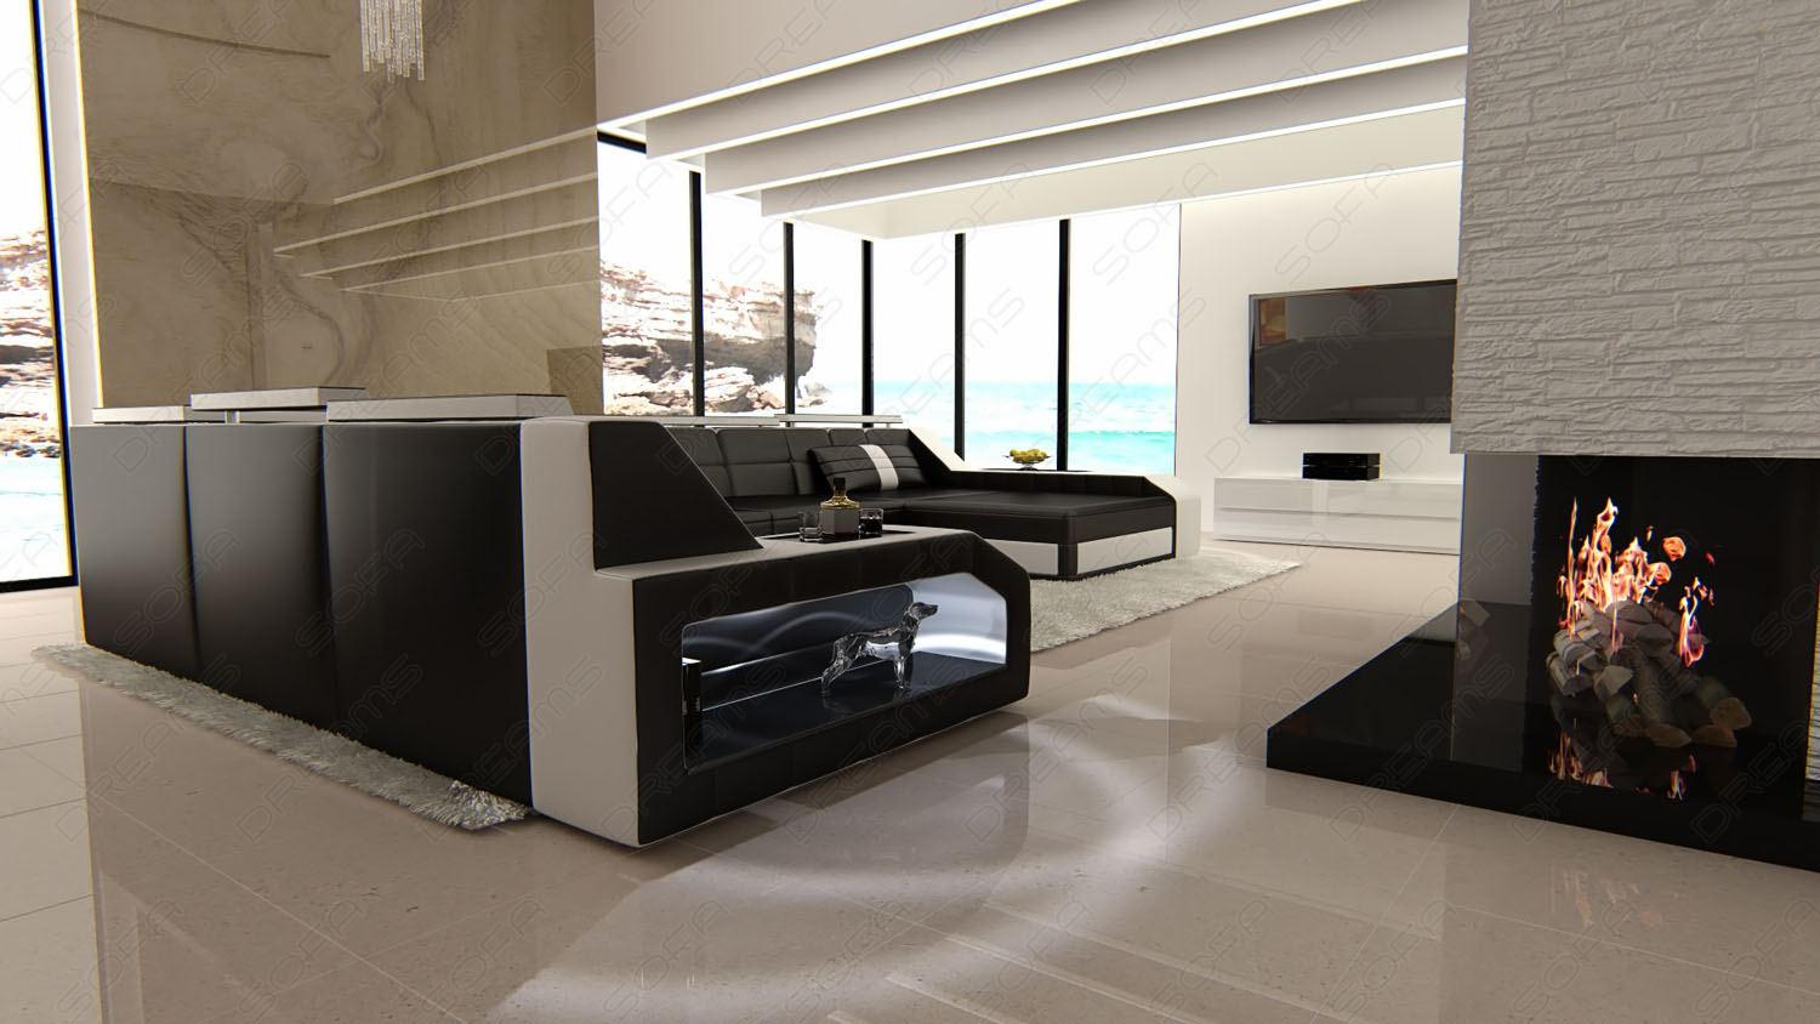 Design Sectional Sofa MATERA XXL with LED Lights black white  eBay